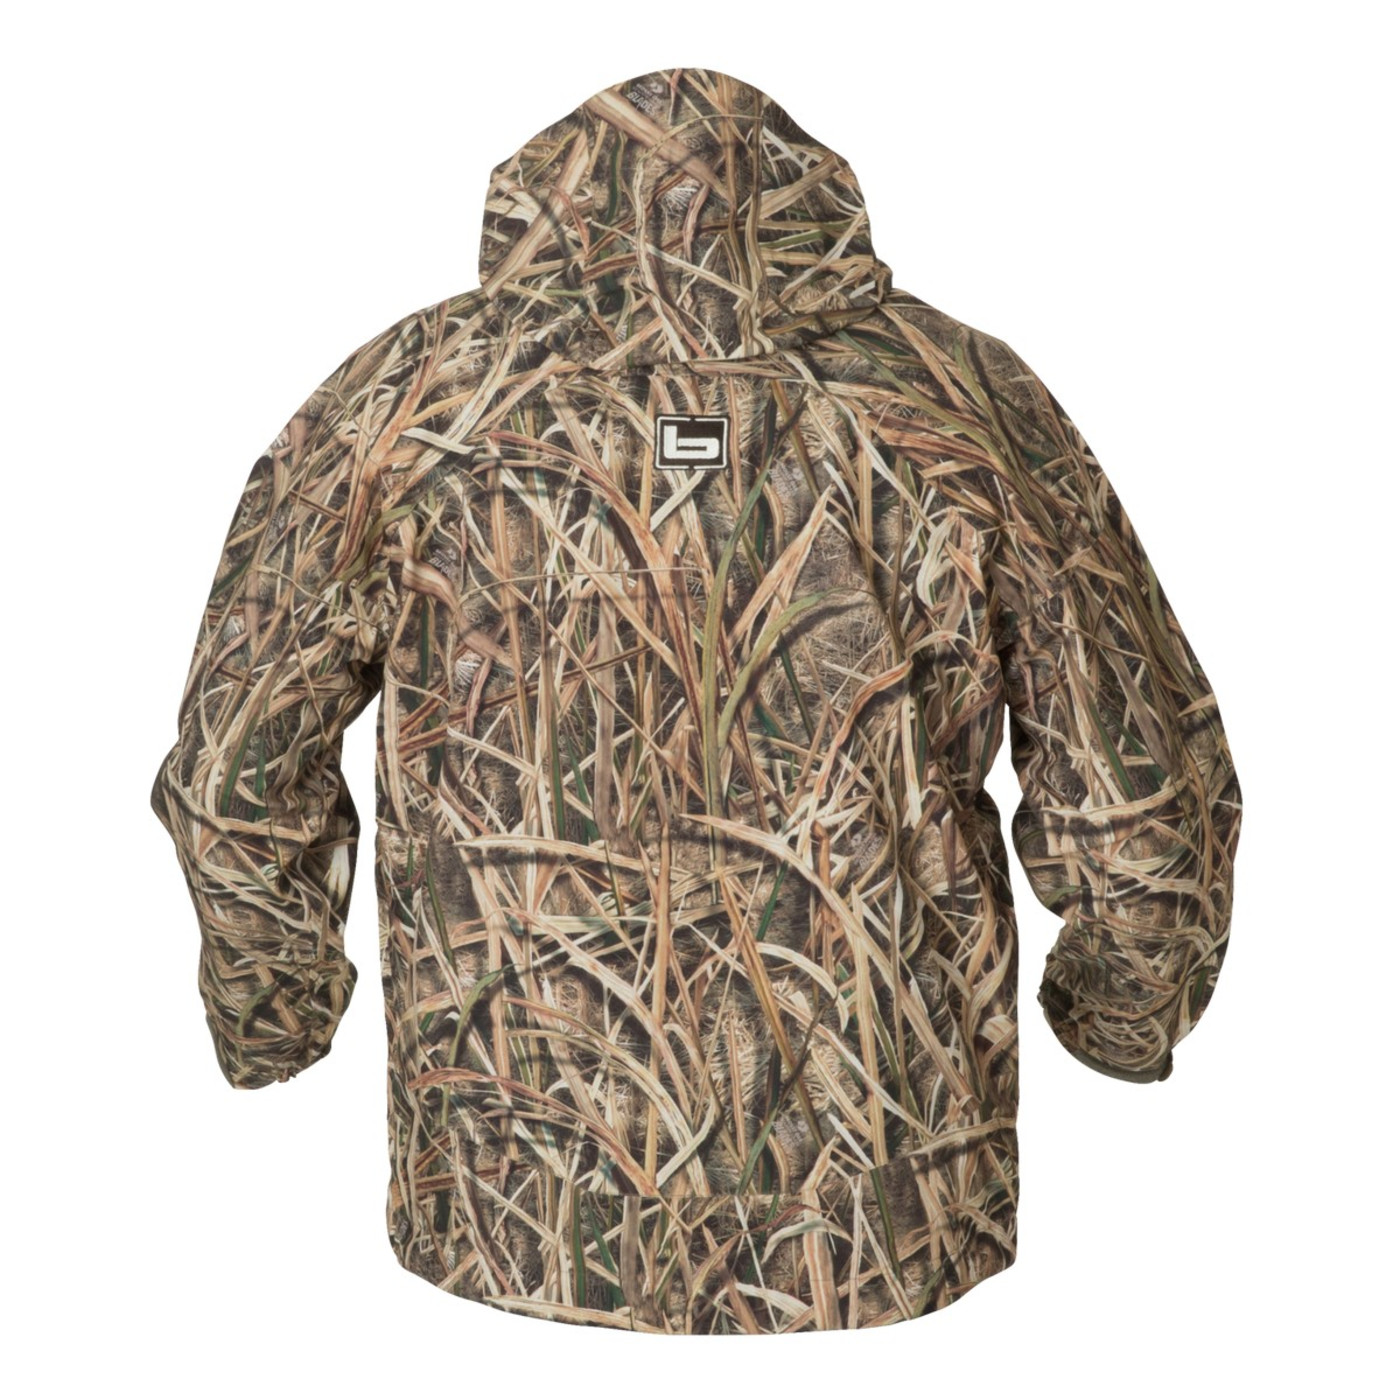 64201deeaf322 Banded Mingo Softshell Wader Jacket